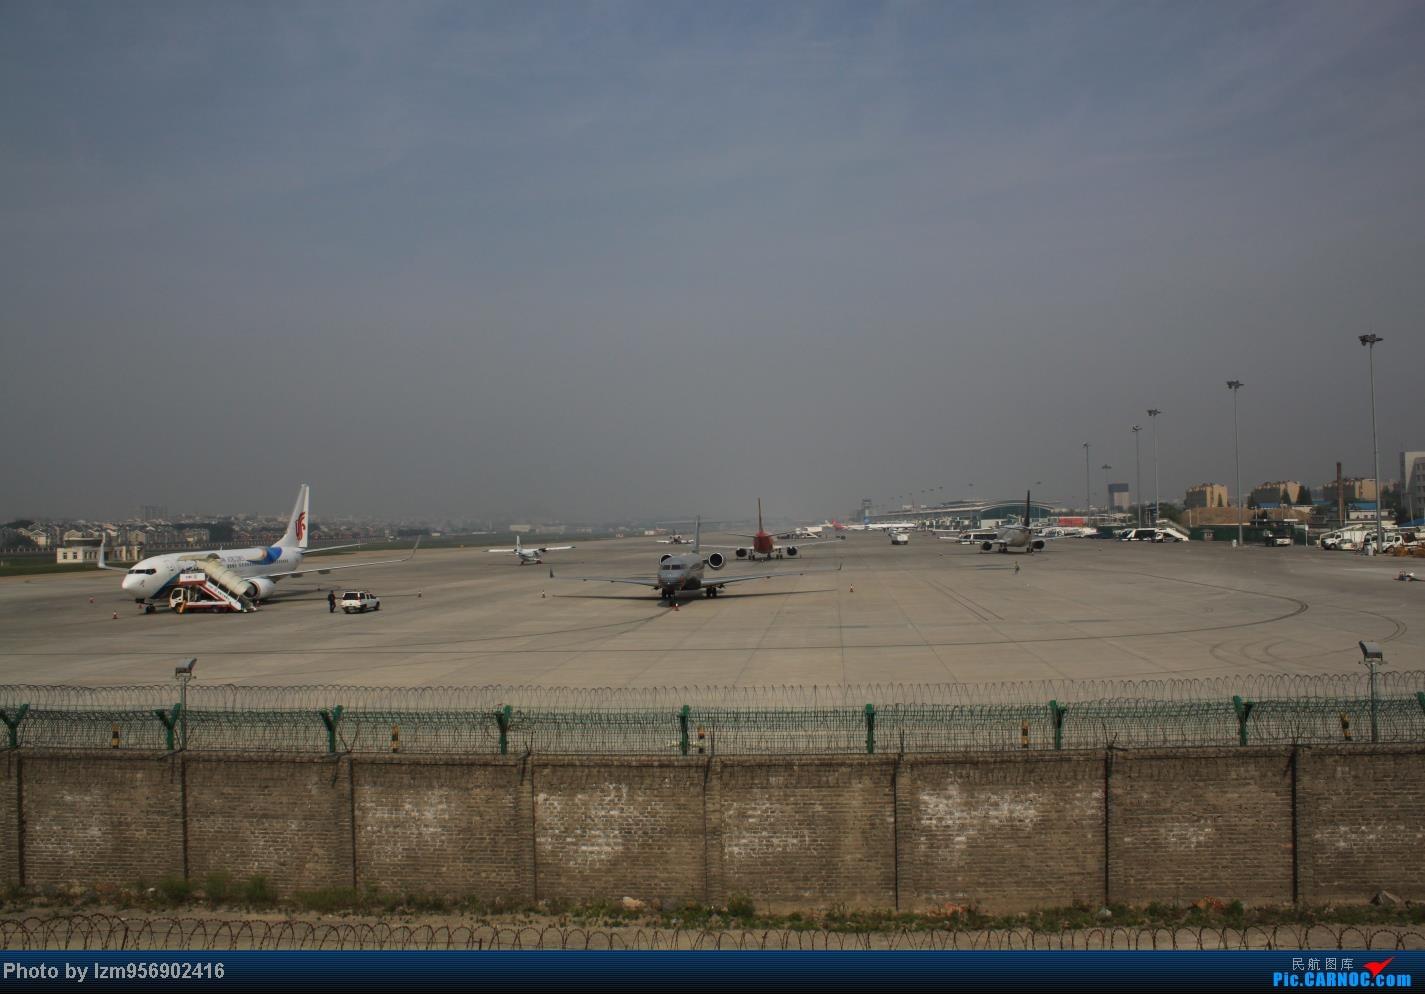 Re:[原创]DLC蹲点大半天,拍到了大棒航空772=w= AIRBUS A320-200 B-6867 中国大连周水子机场 中国大连周水子机场